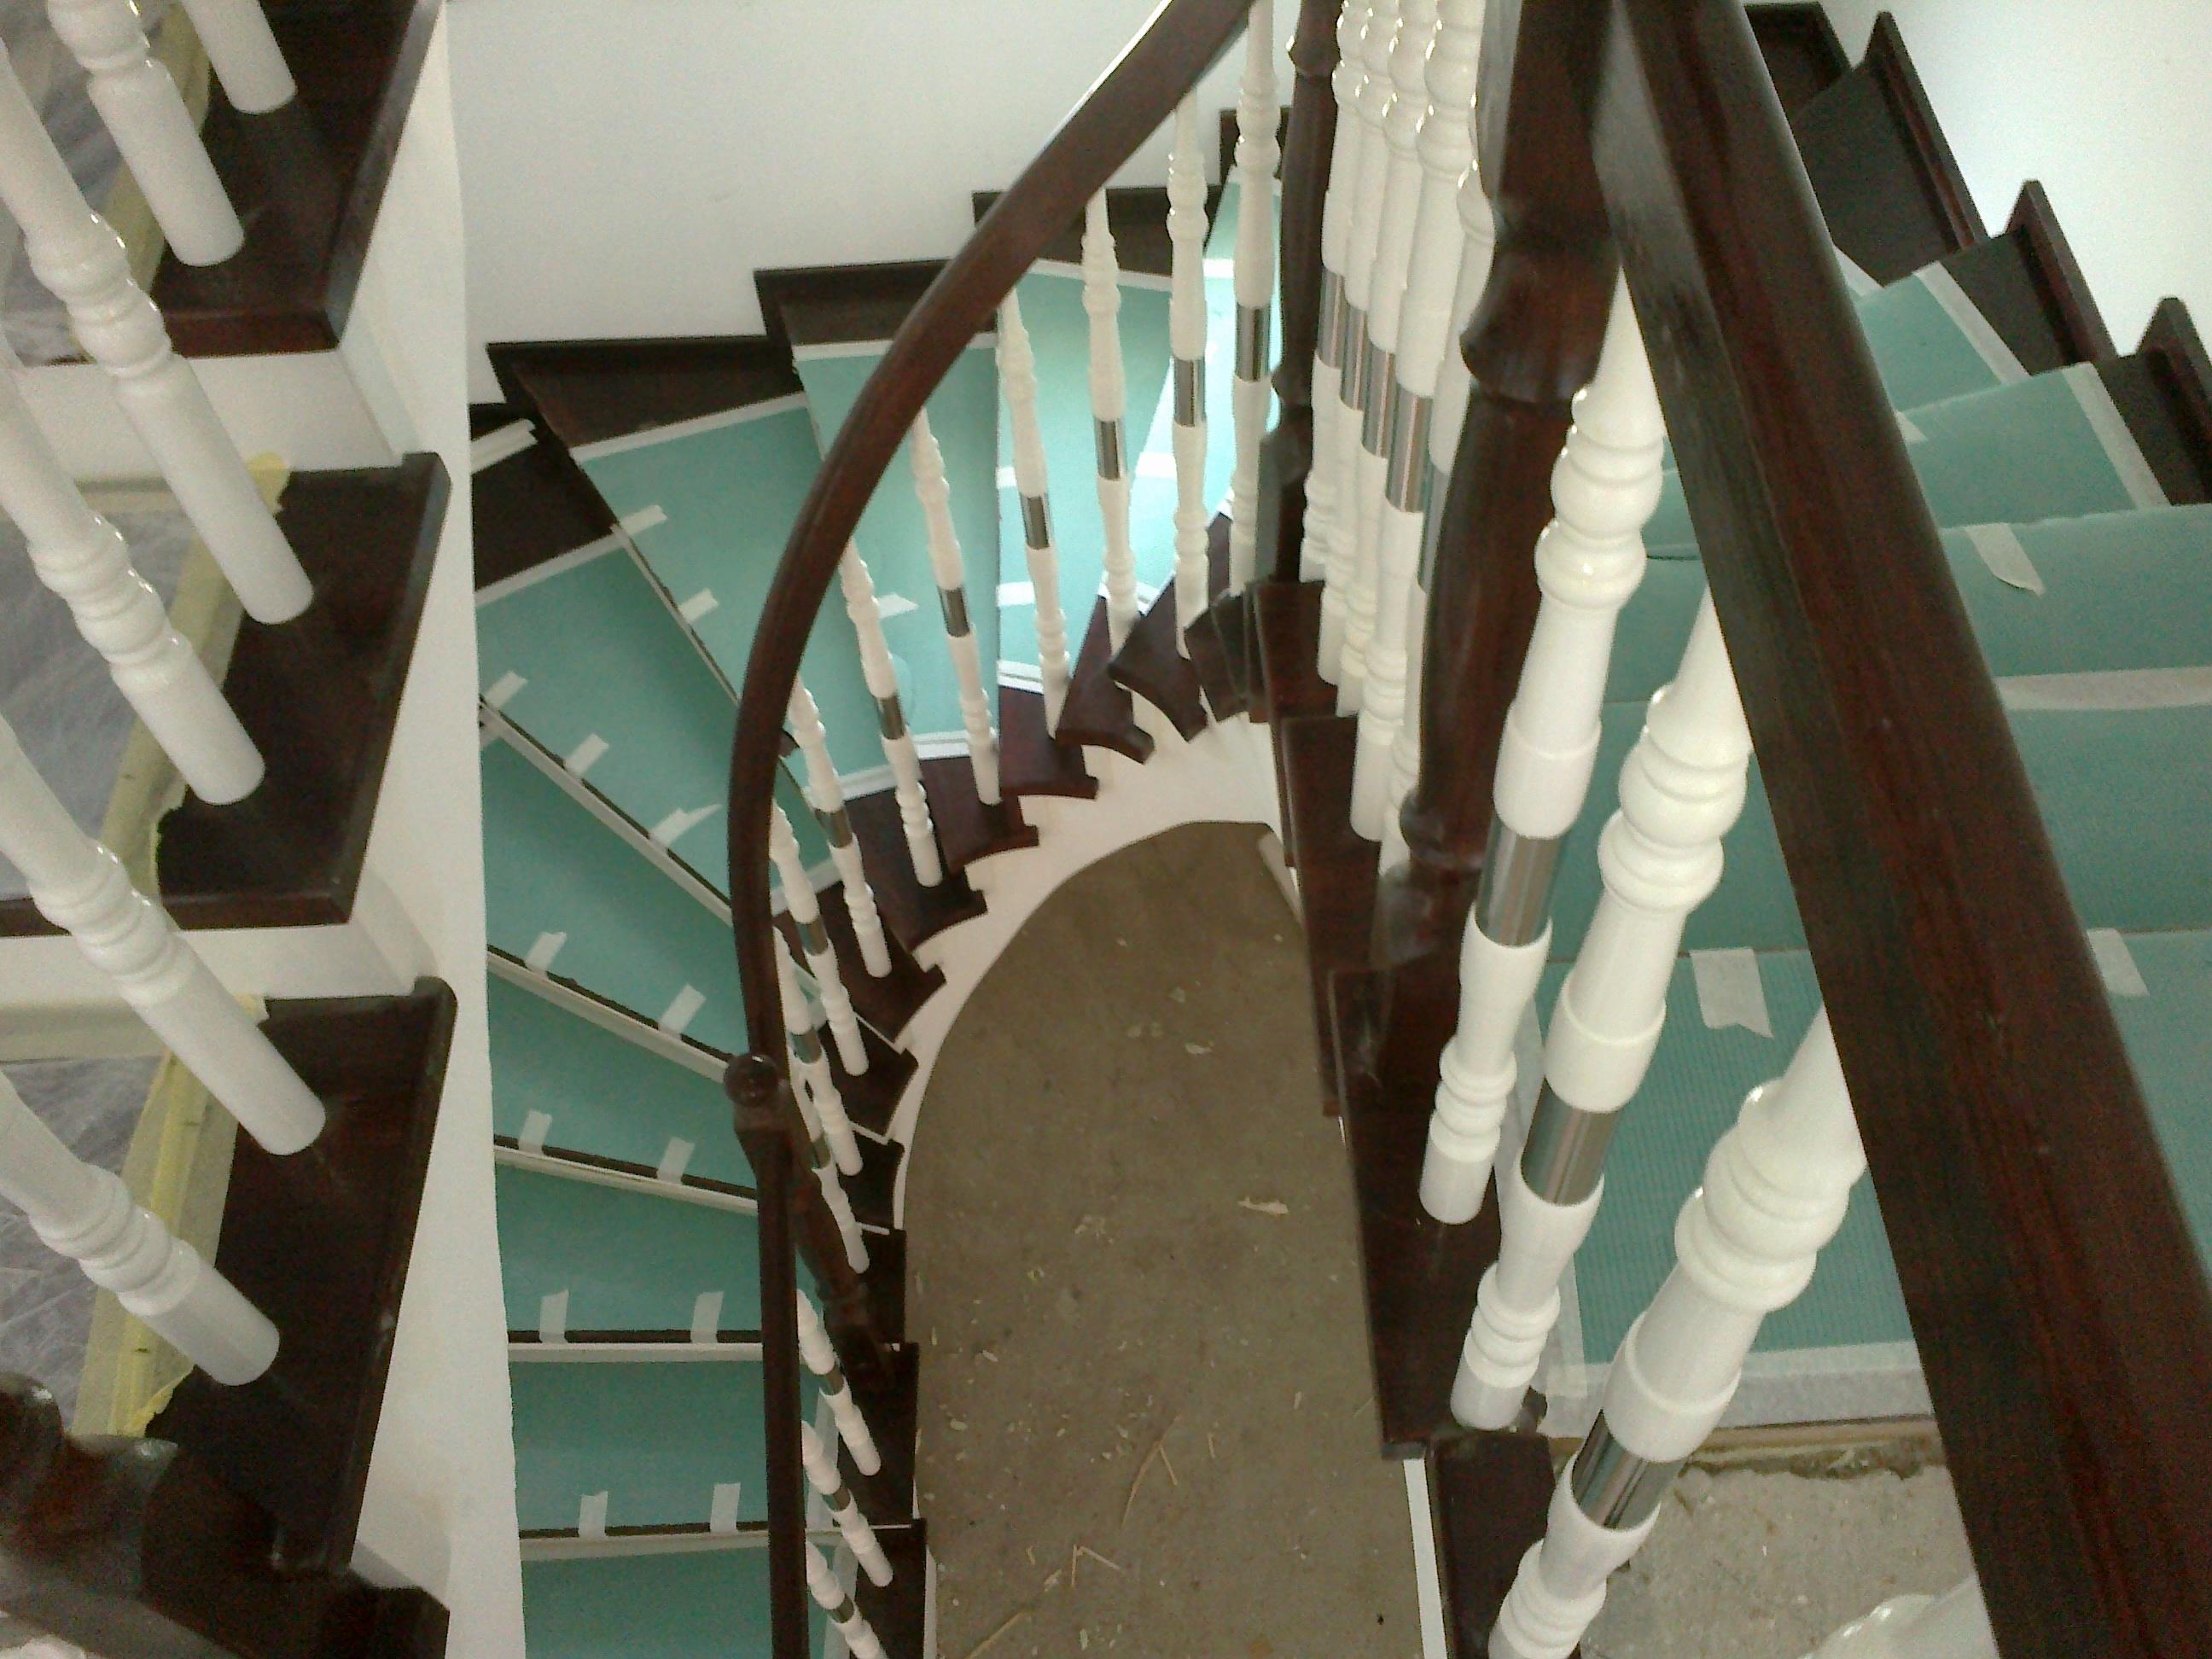 Trepte si Balustrada din lemn - Scara din beton realizata pe curb 1 TURSO HOLZ - Poza 12